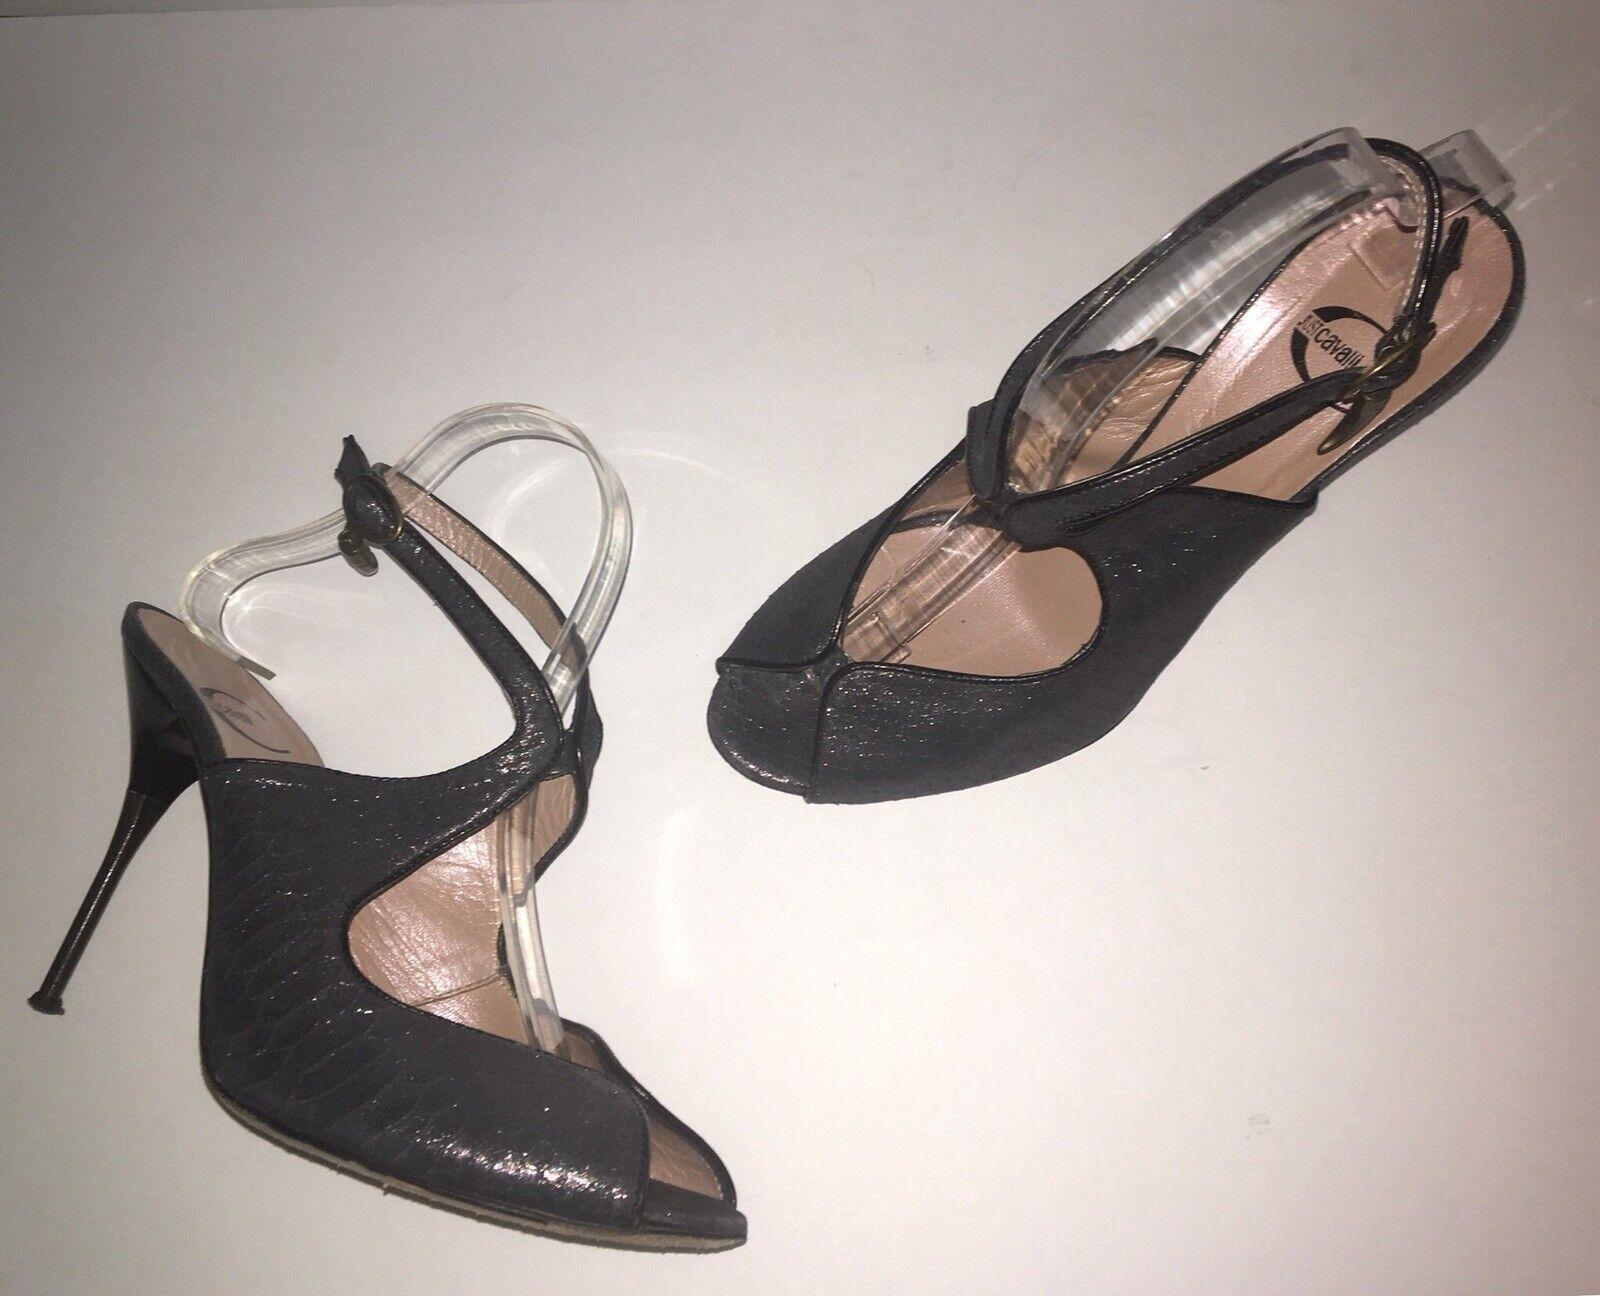 JUST CAVALLI Peep Toe Snake Emossed Logo Ankle Ankle Ankle Strap W  Metal klackar US 10 EU 40  spara 50% -75% rabatt